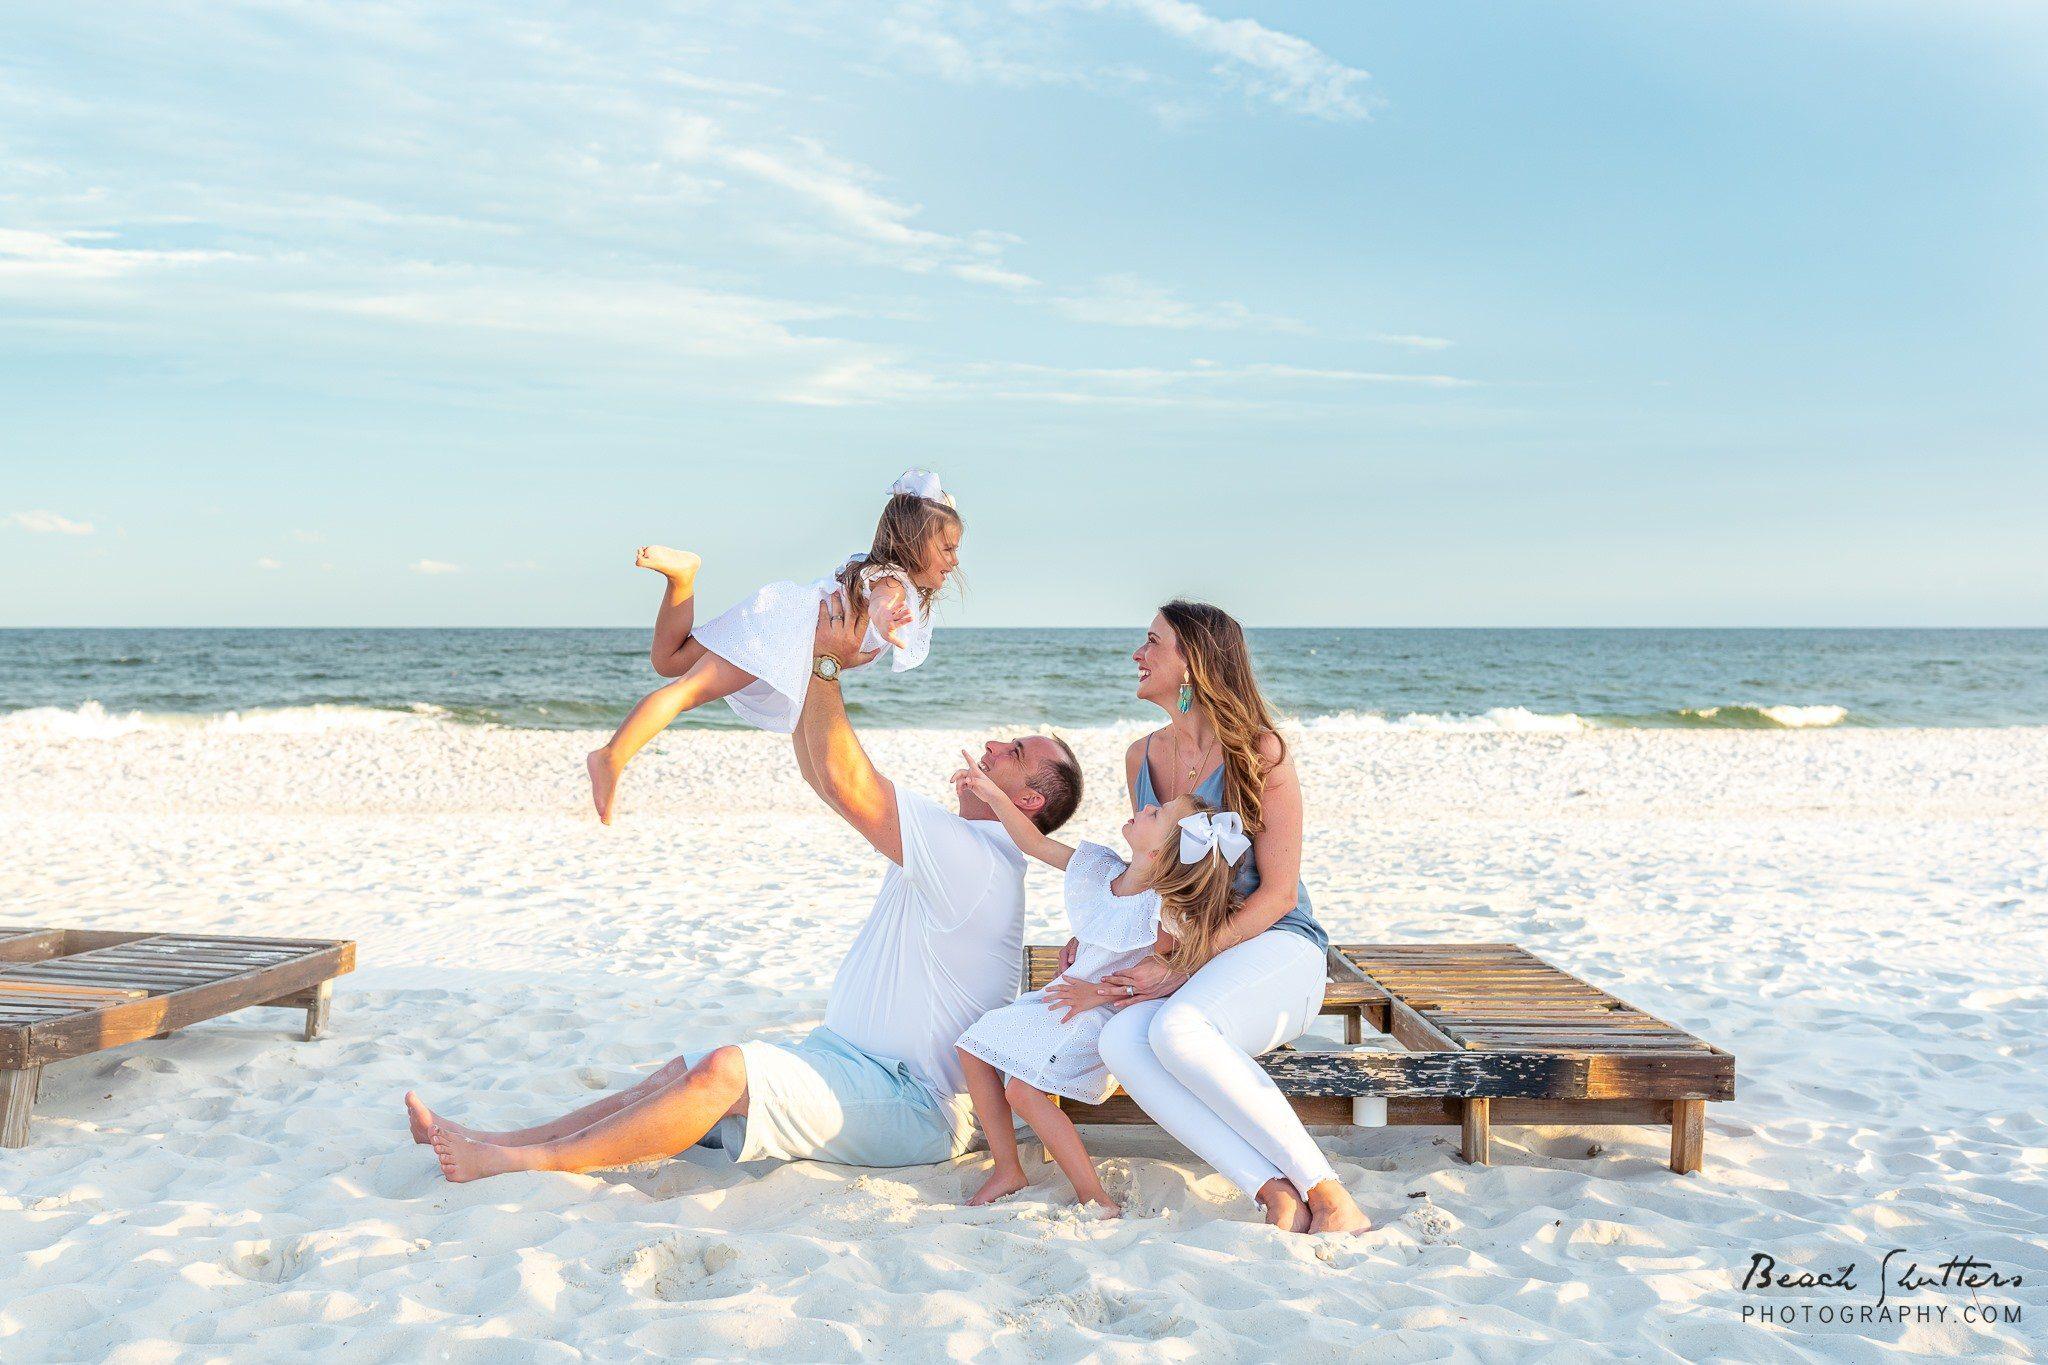 Orange Beach photo sessions